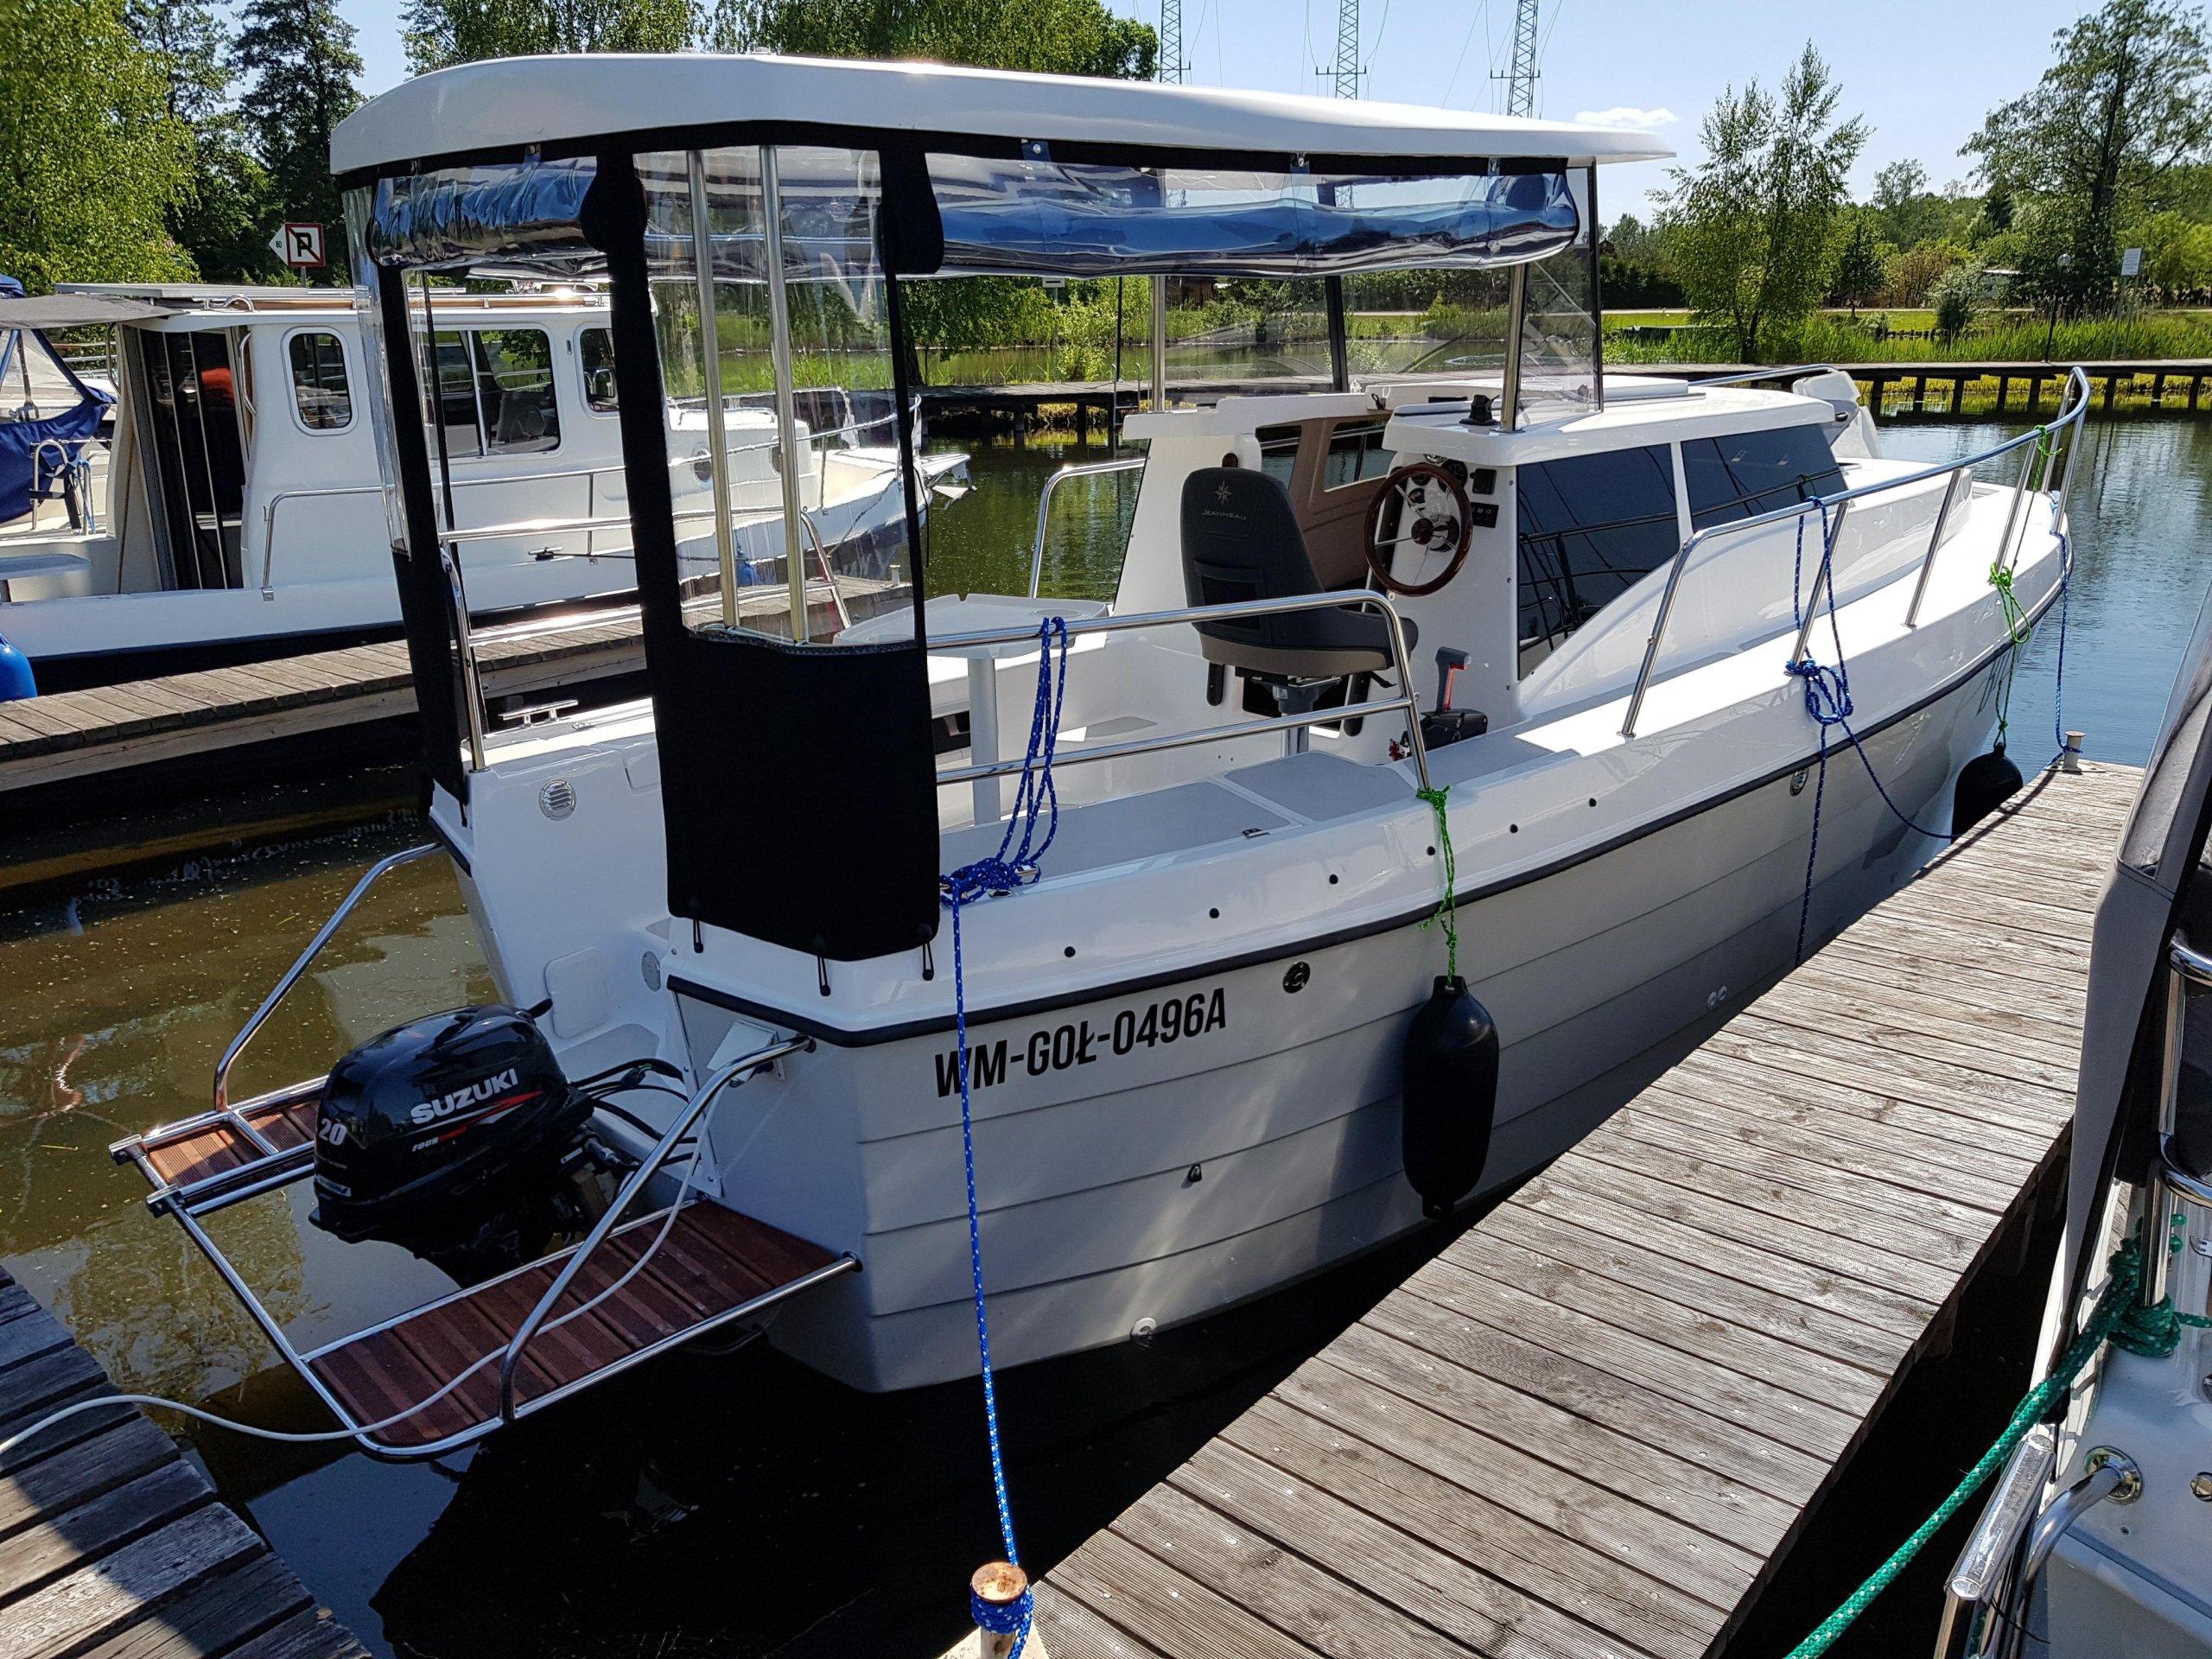 jacht LAGUNA 700 czarter bez patentu 7/07 -280zl